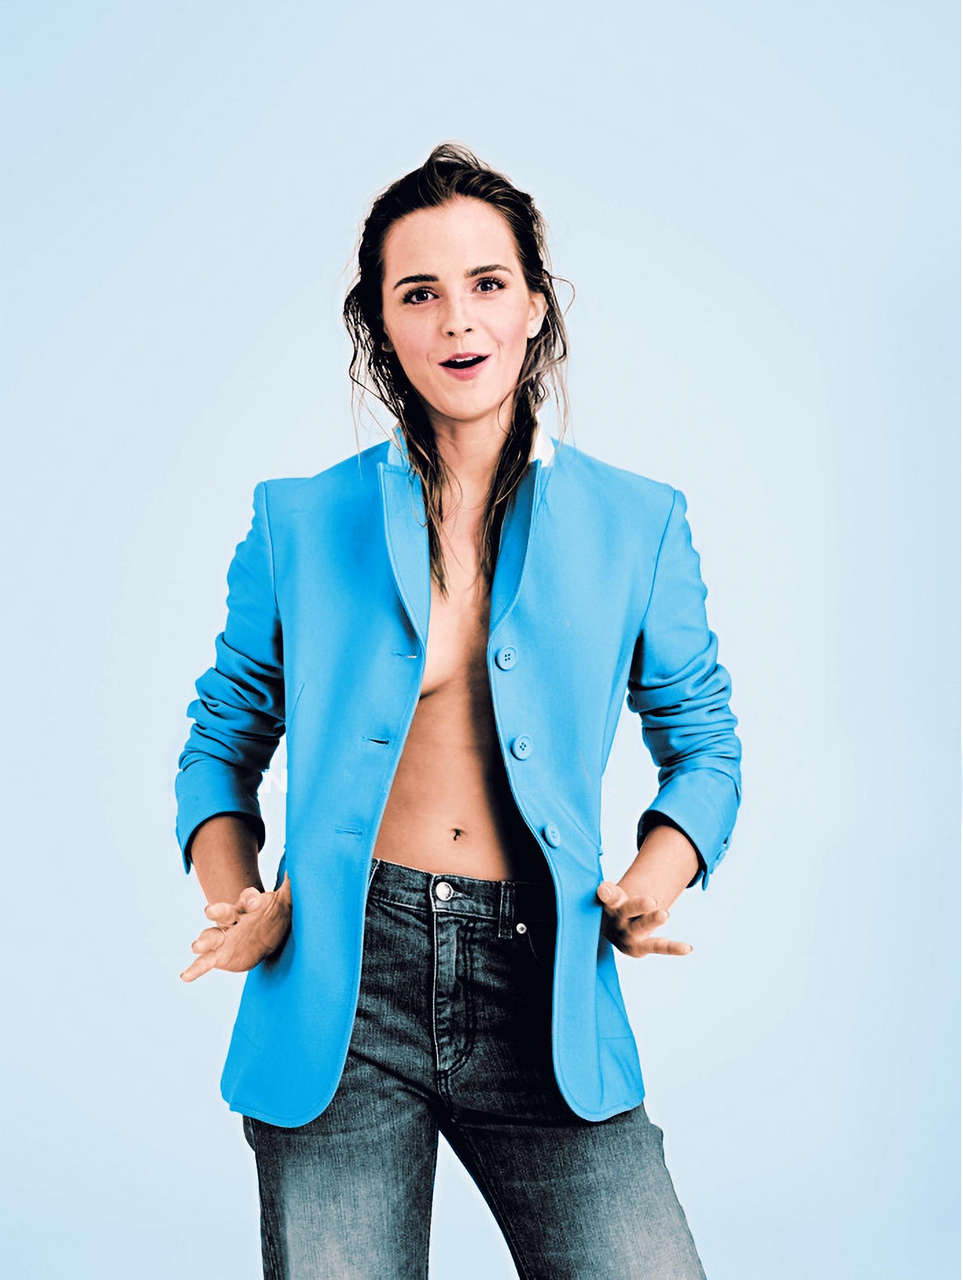 Emma Watson NSFW (4 photos)